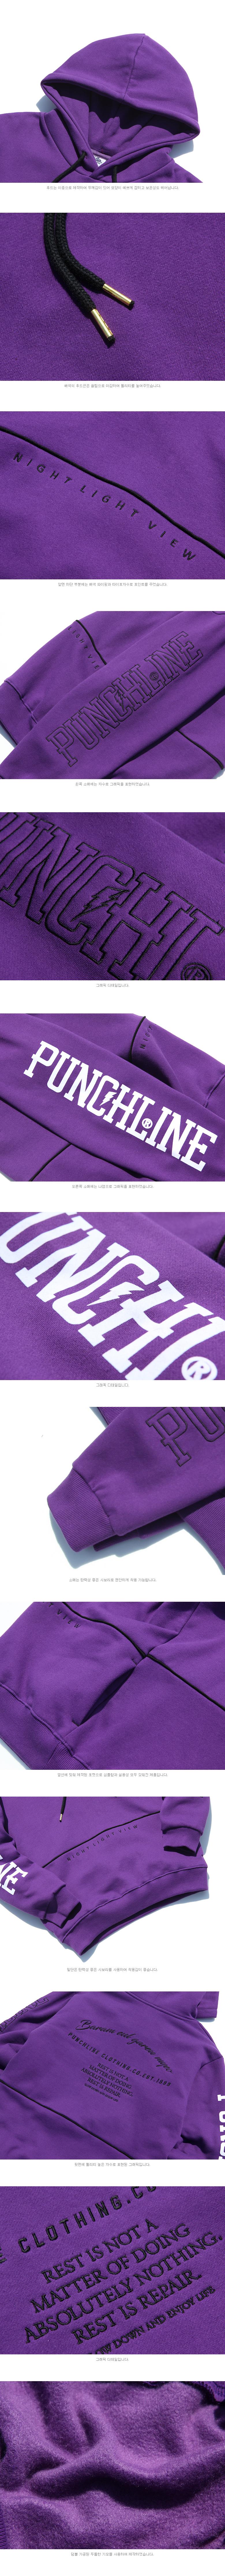 20180905_pl_KHHD6100_detail_purple_02.jpg